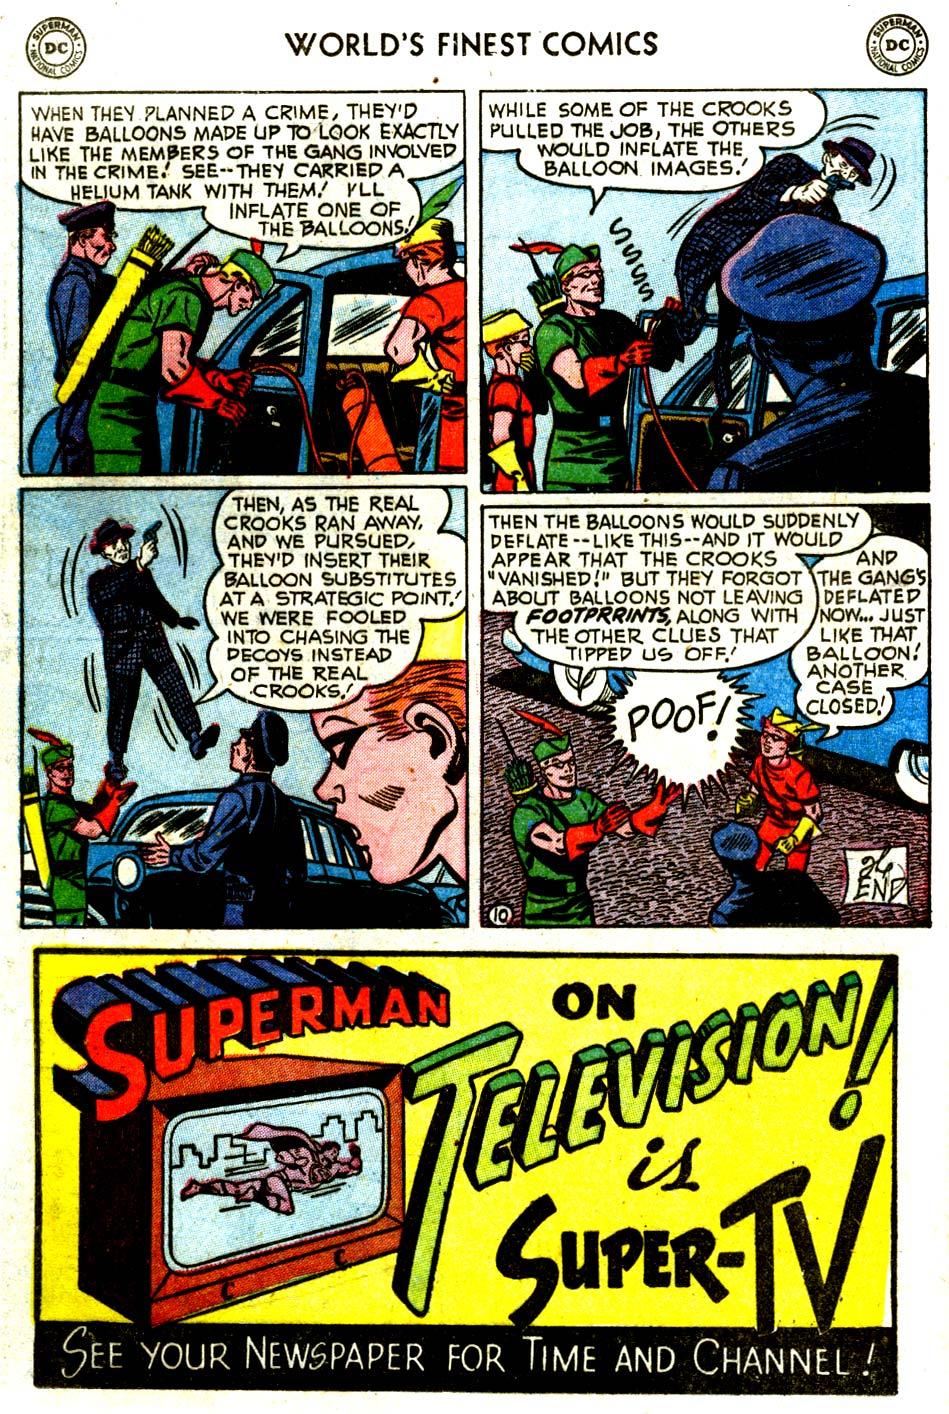 Read online World's Finest Comics comic -  Issue #68 - 36